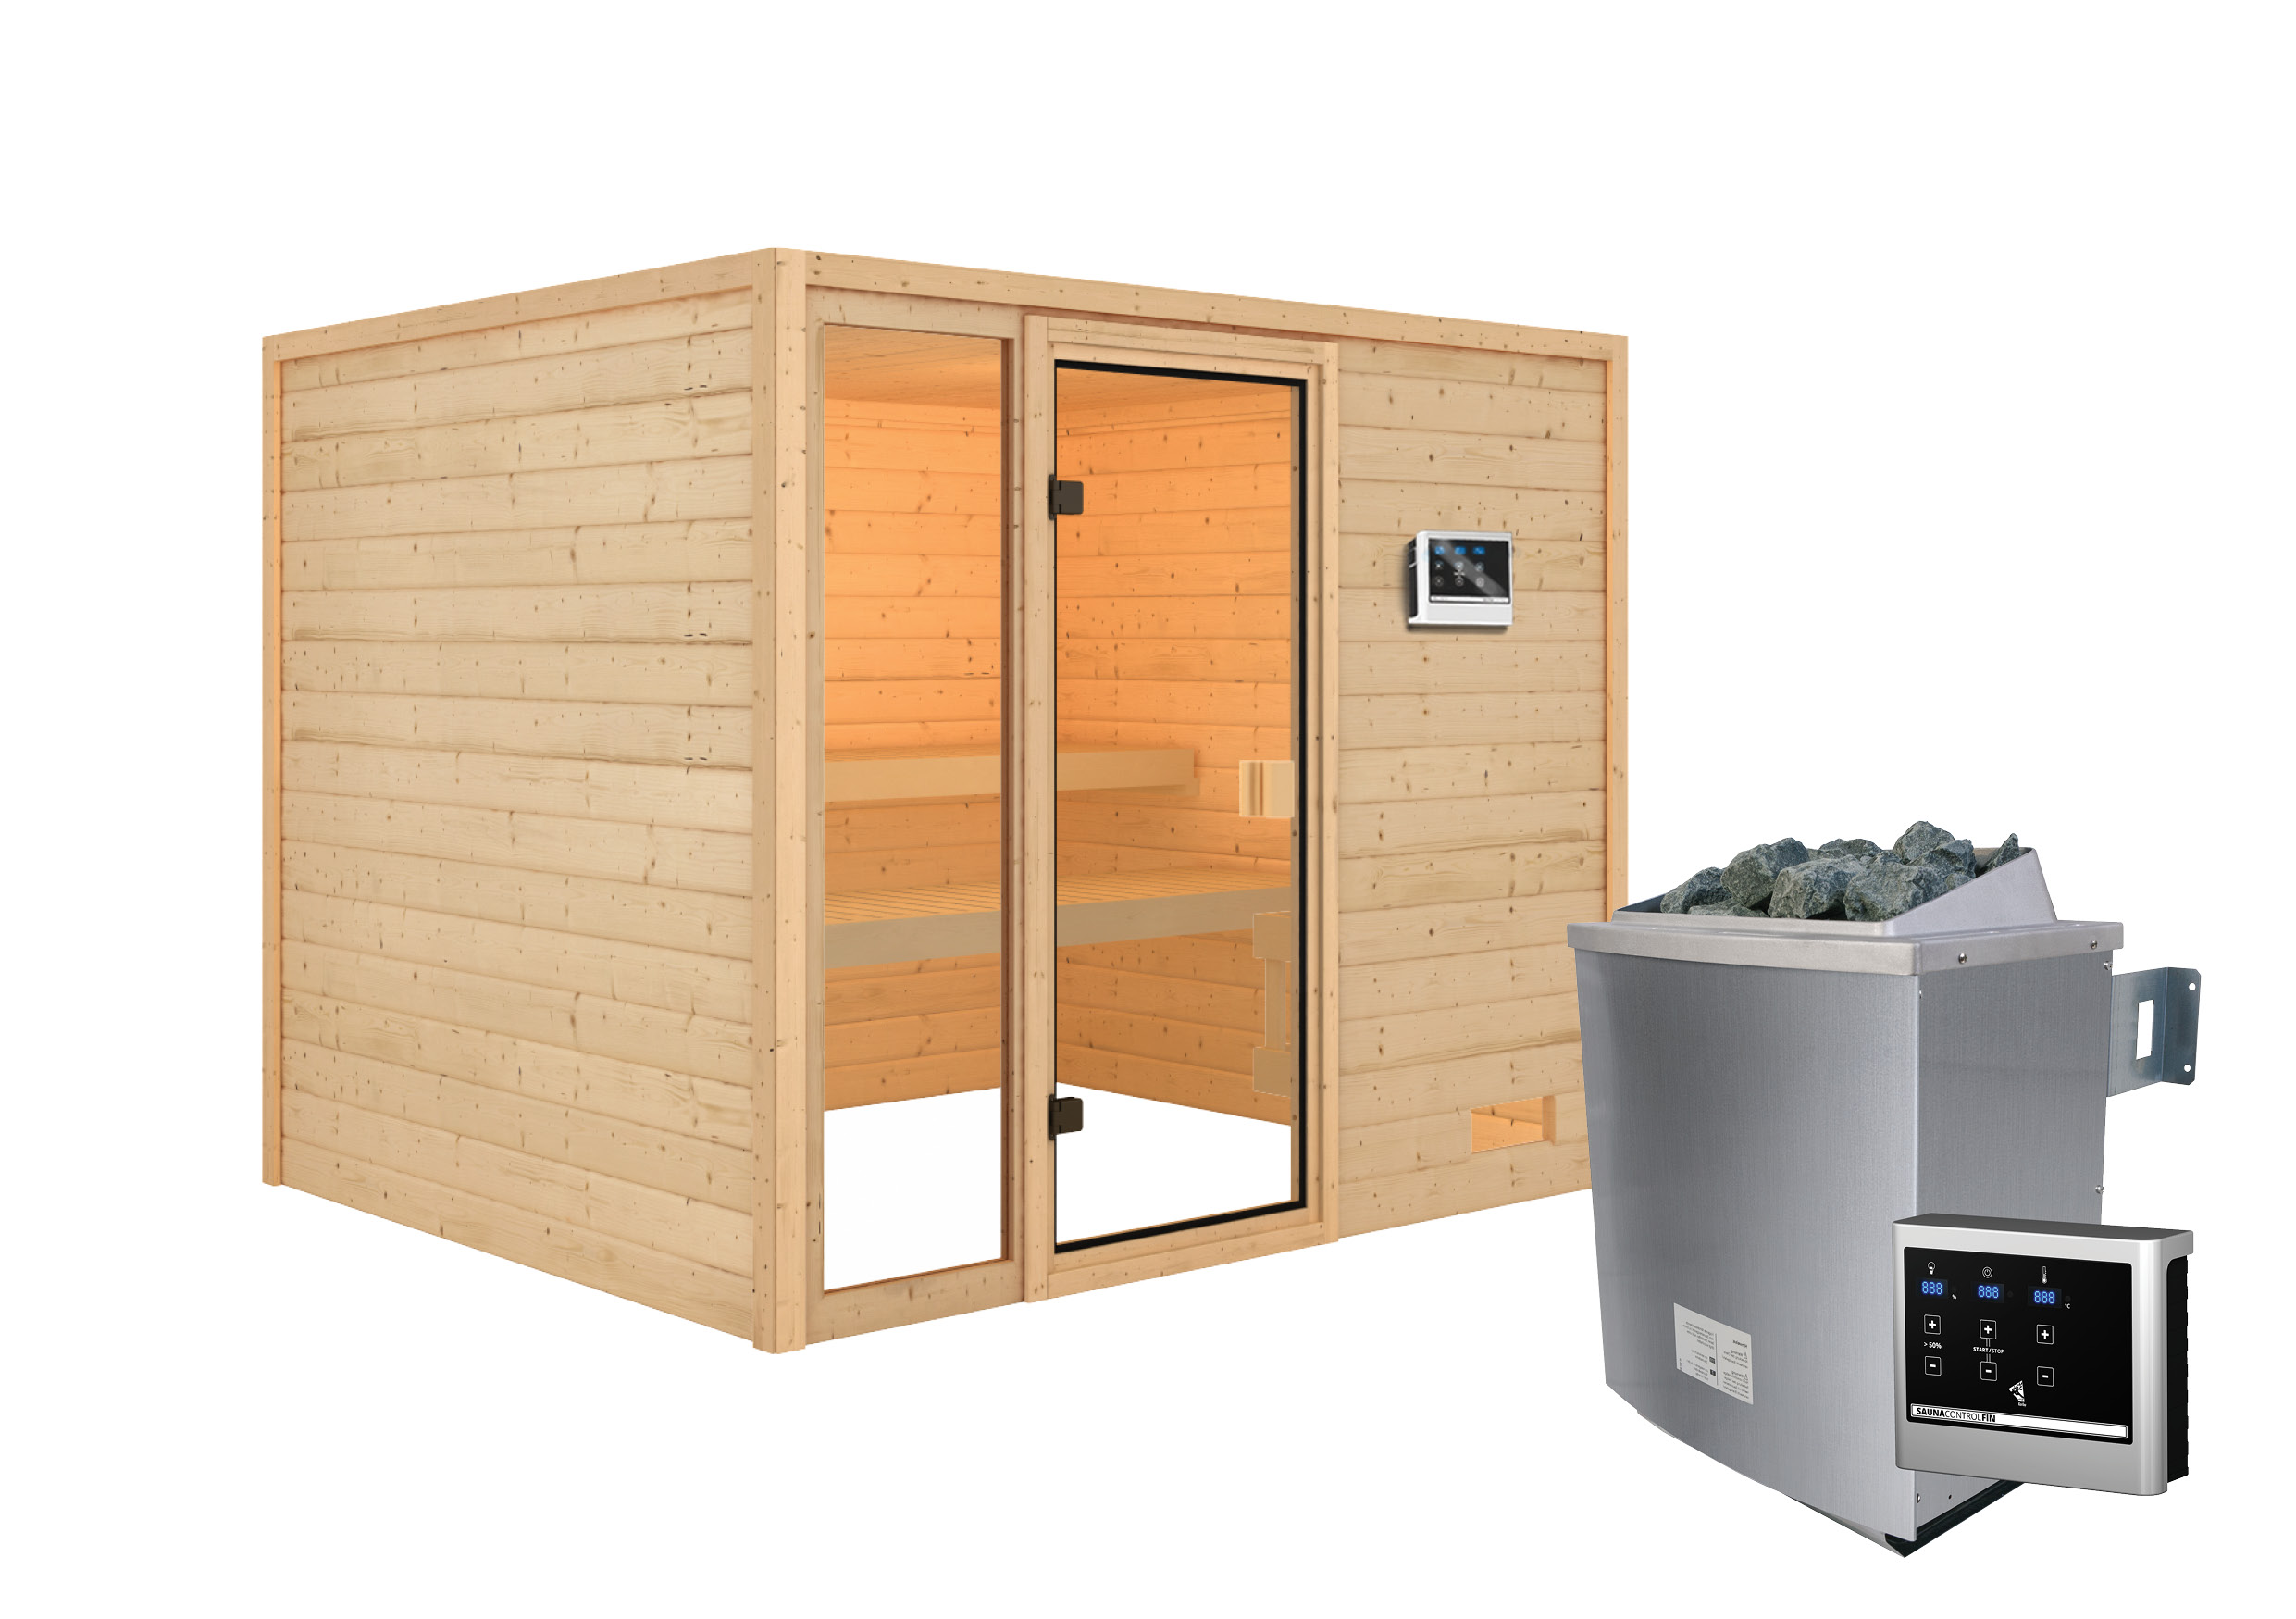 Woodfeeling Sauna Kiana 38mm Saunaofen 9 kW extern Bild 7